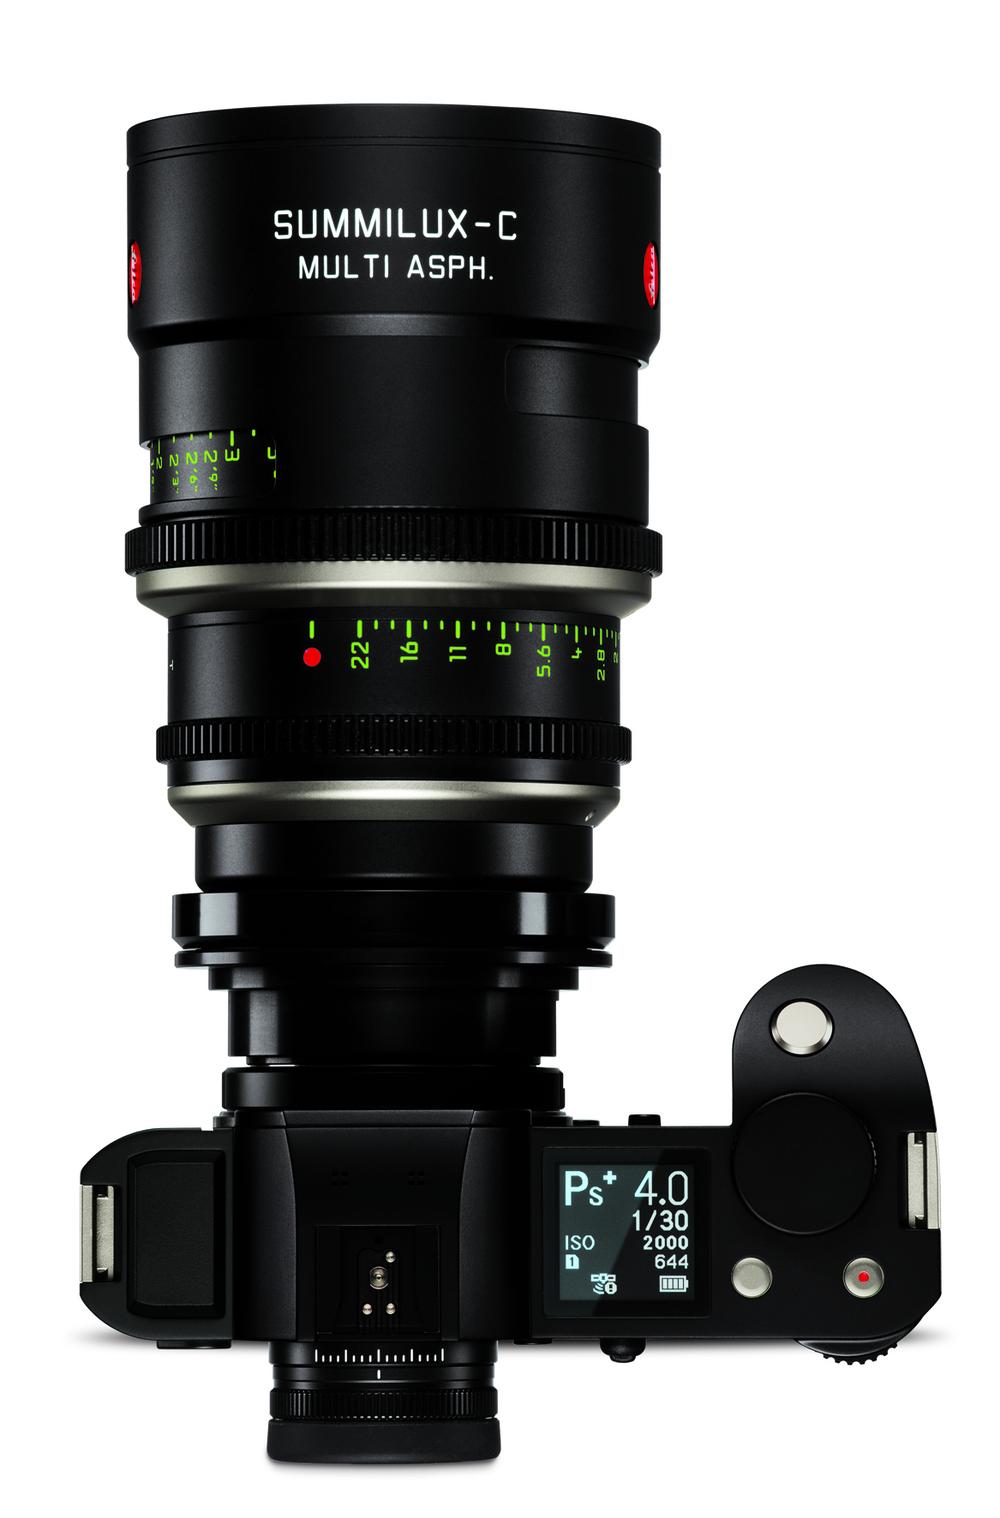 The Leica SL (type 601) Professional Mirrorless Camera ...